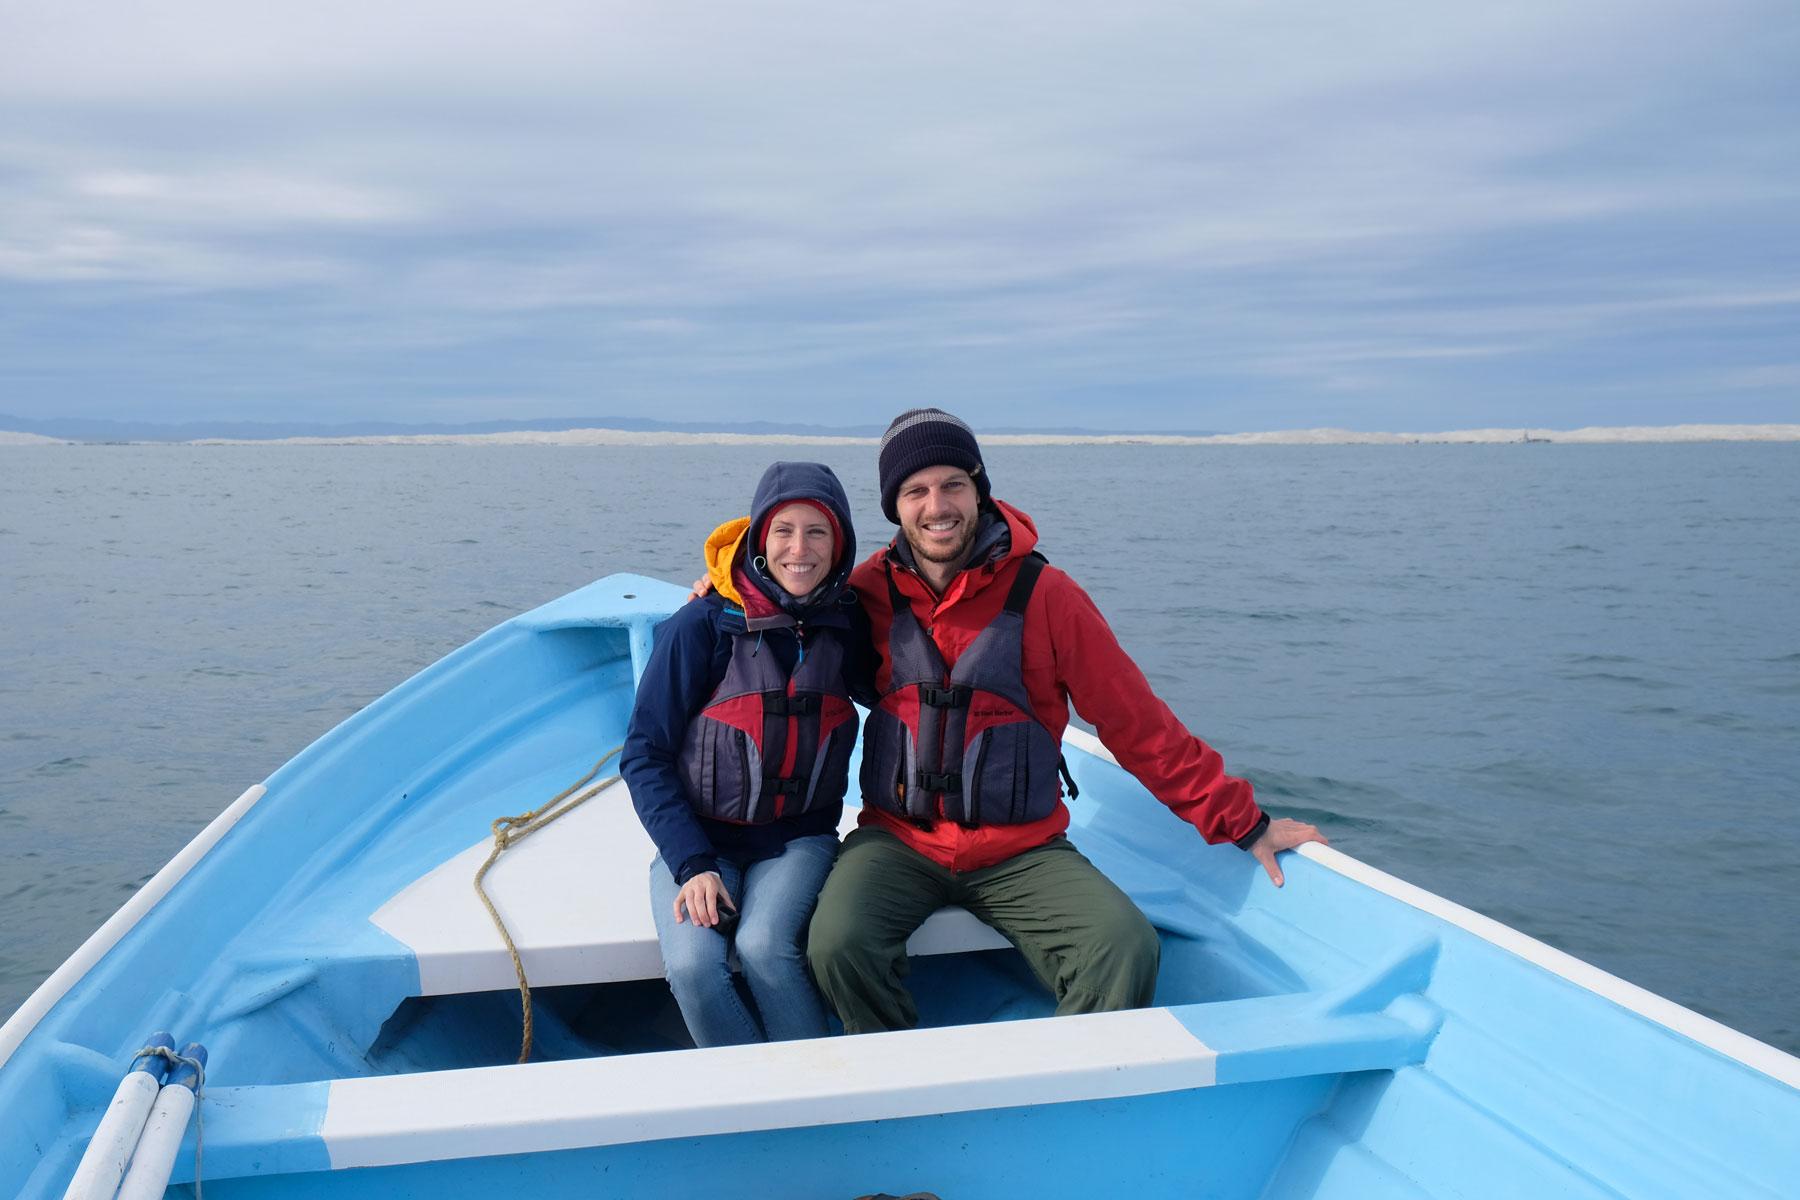 Leo und Sebastian sitzen in einem kleinen Boot in der Lagune Guerrero Negro in Mexiko.